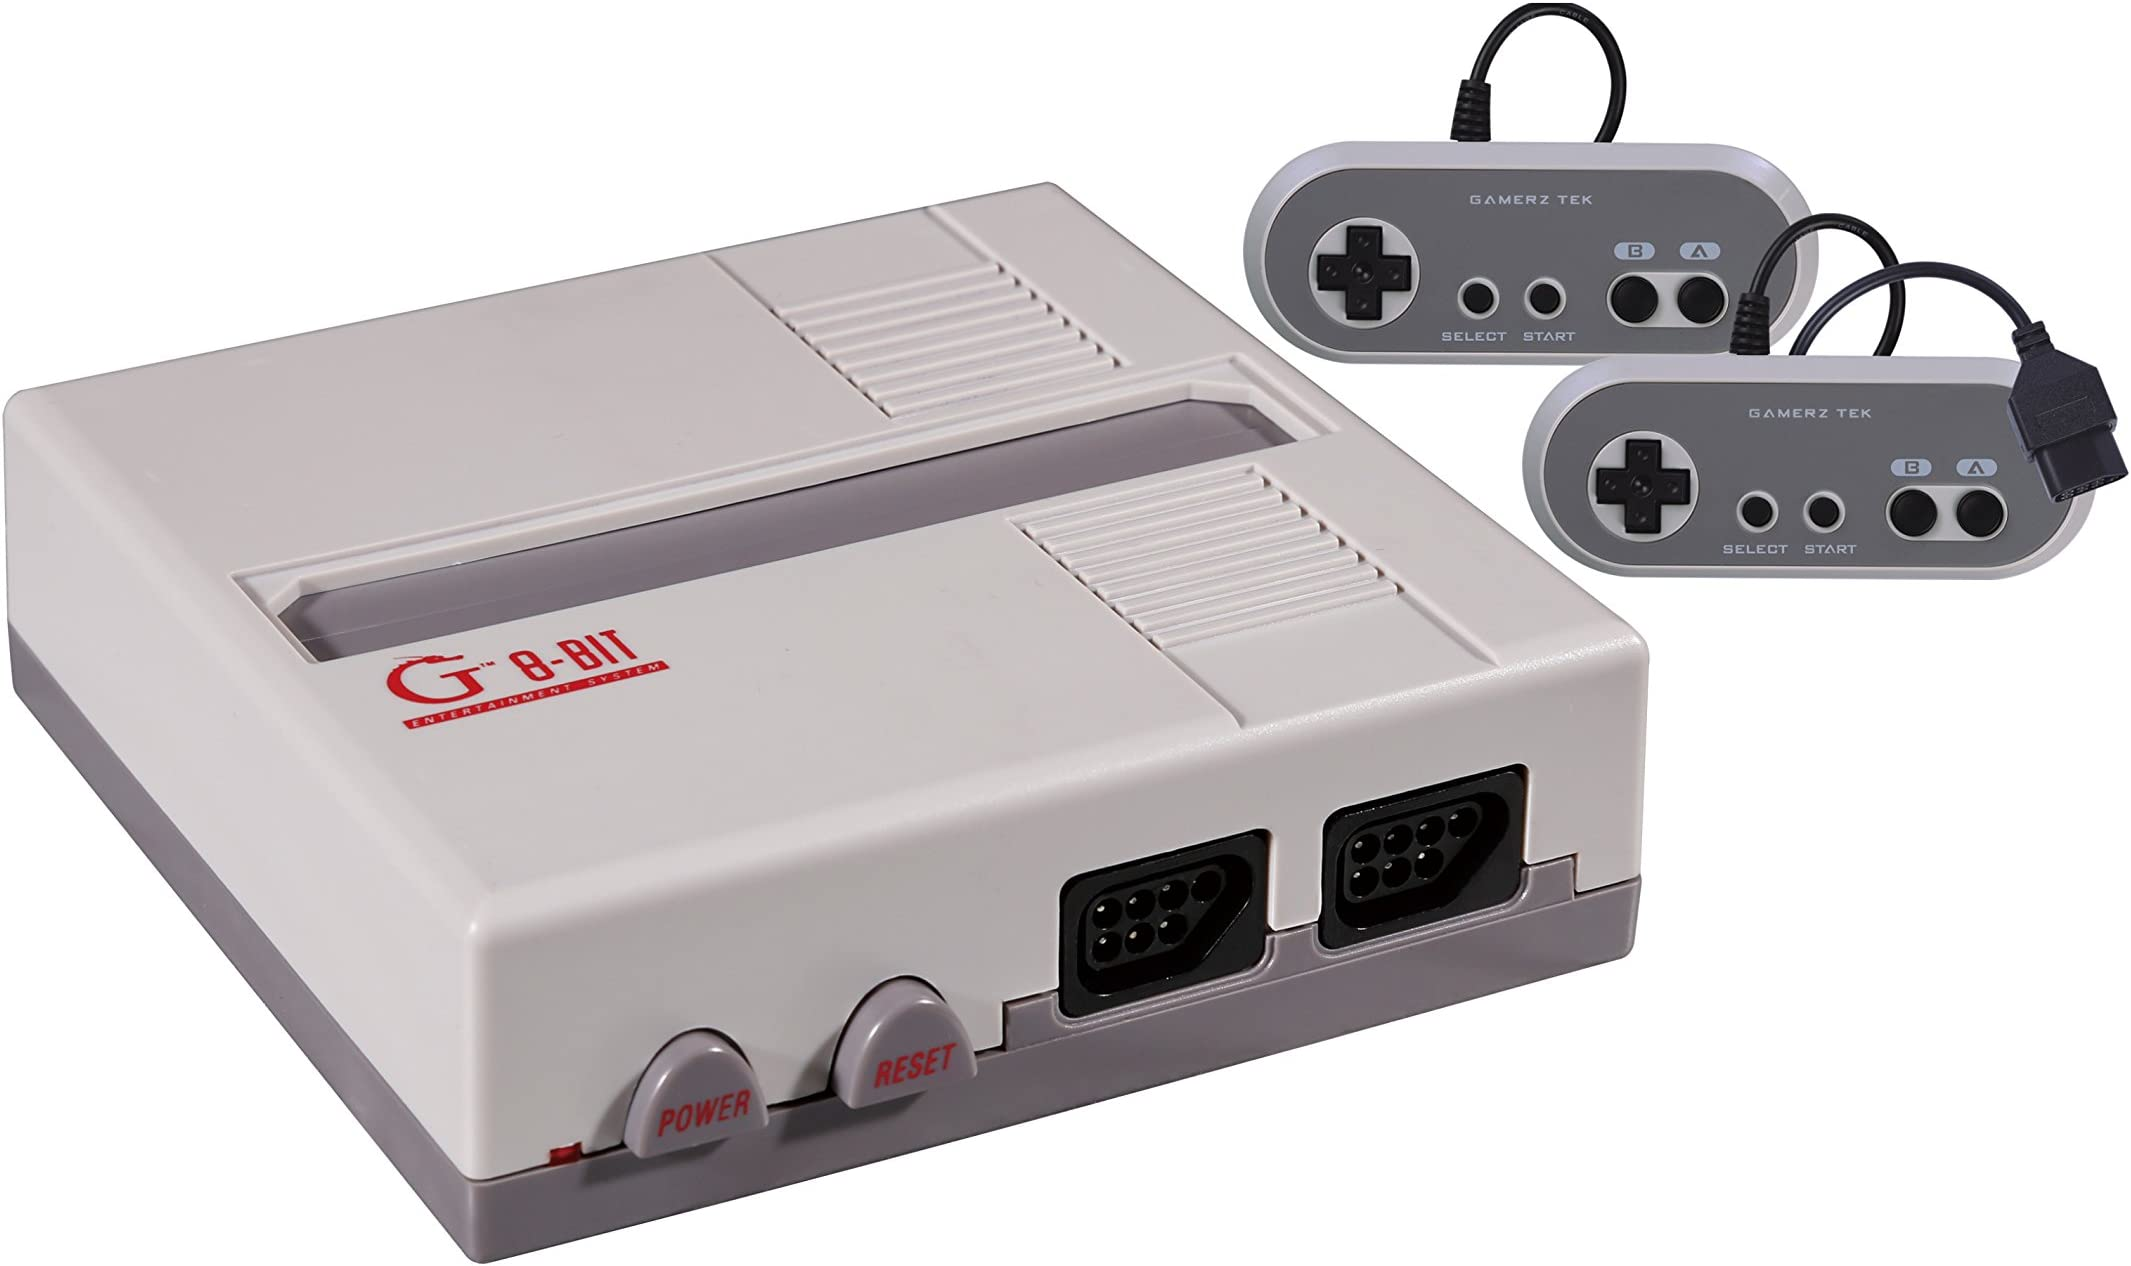 8 Bit Entertainment System Video Games Game Kaset Nintendo Wii New Super Mario Bros Image Unavailable